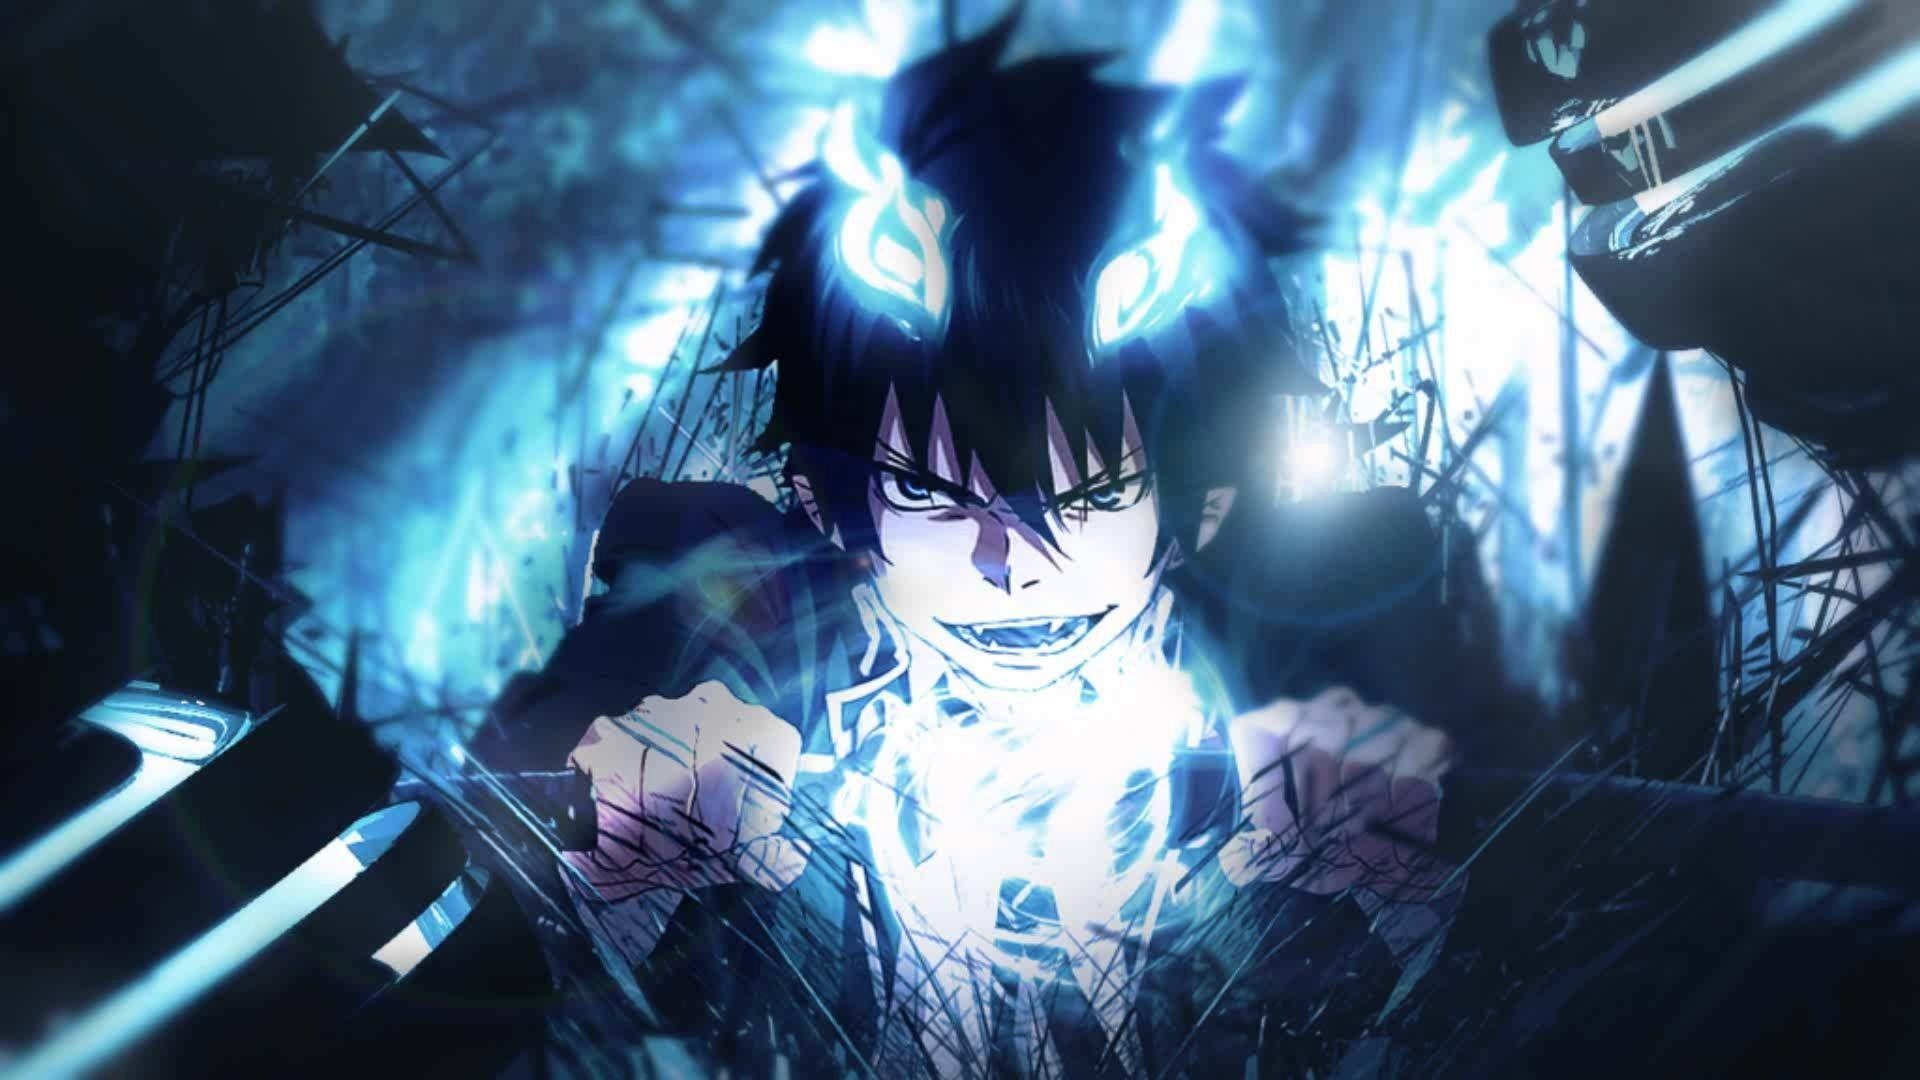 Blue Exorcist Okumura Rin 1080p Wallpaper Hdwallpaper Desktop Rin Okumura Menina Anime Onii San